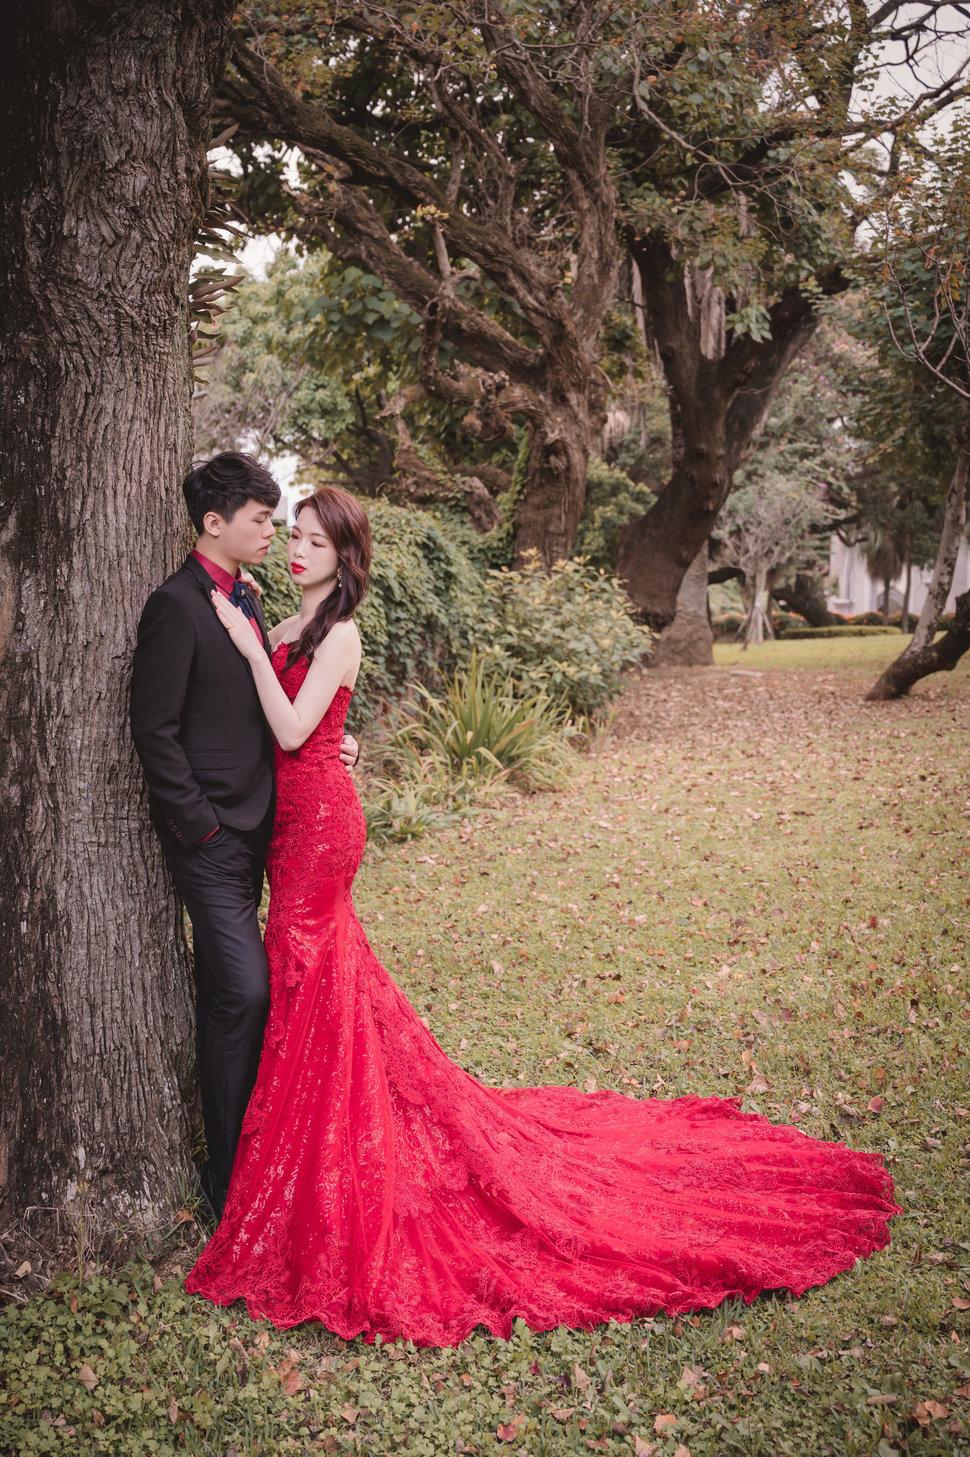 20200111-YEU_5653-1 - 花蓮婚紗 - Sposa Bella《結婚吧》